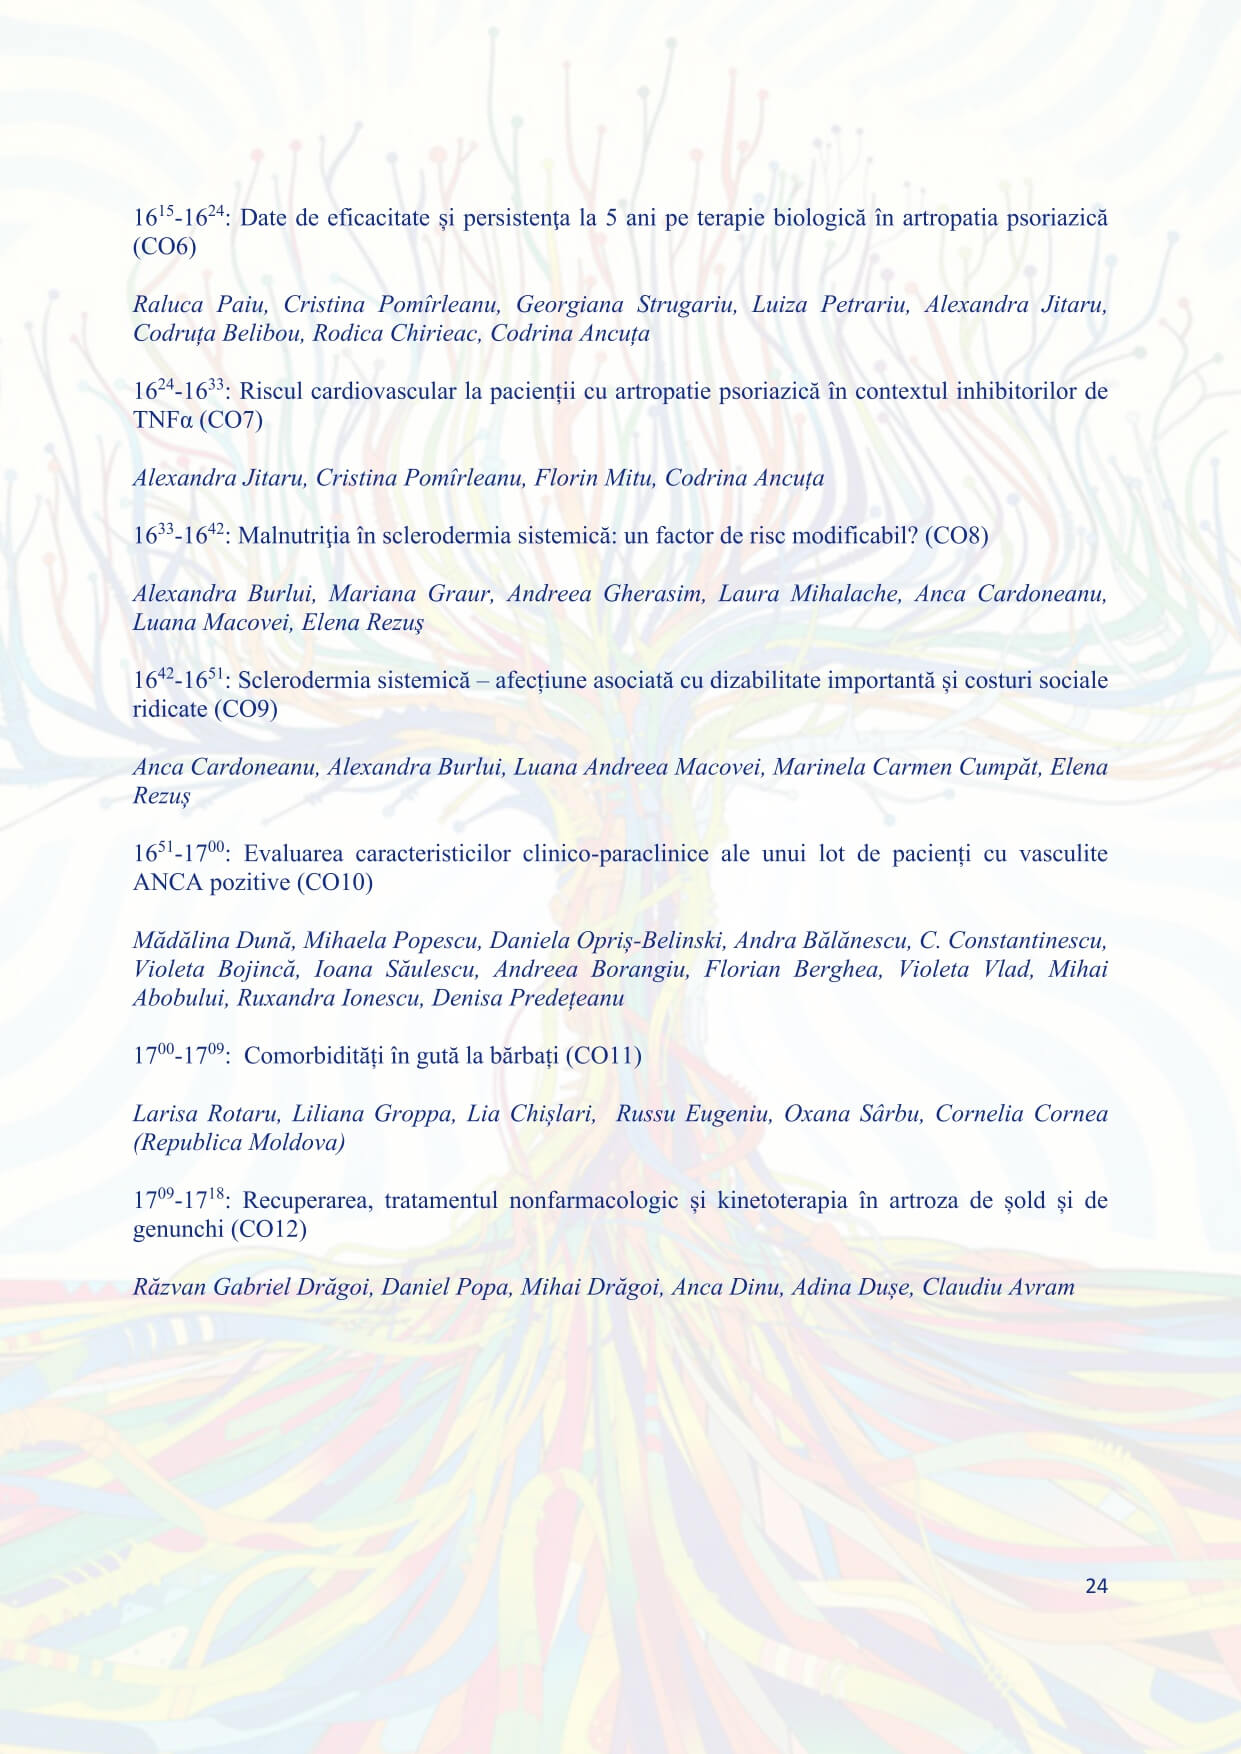 Program_CNR_2019_final__23,09,19_________________page-0024